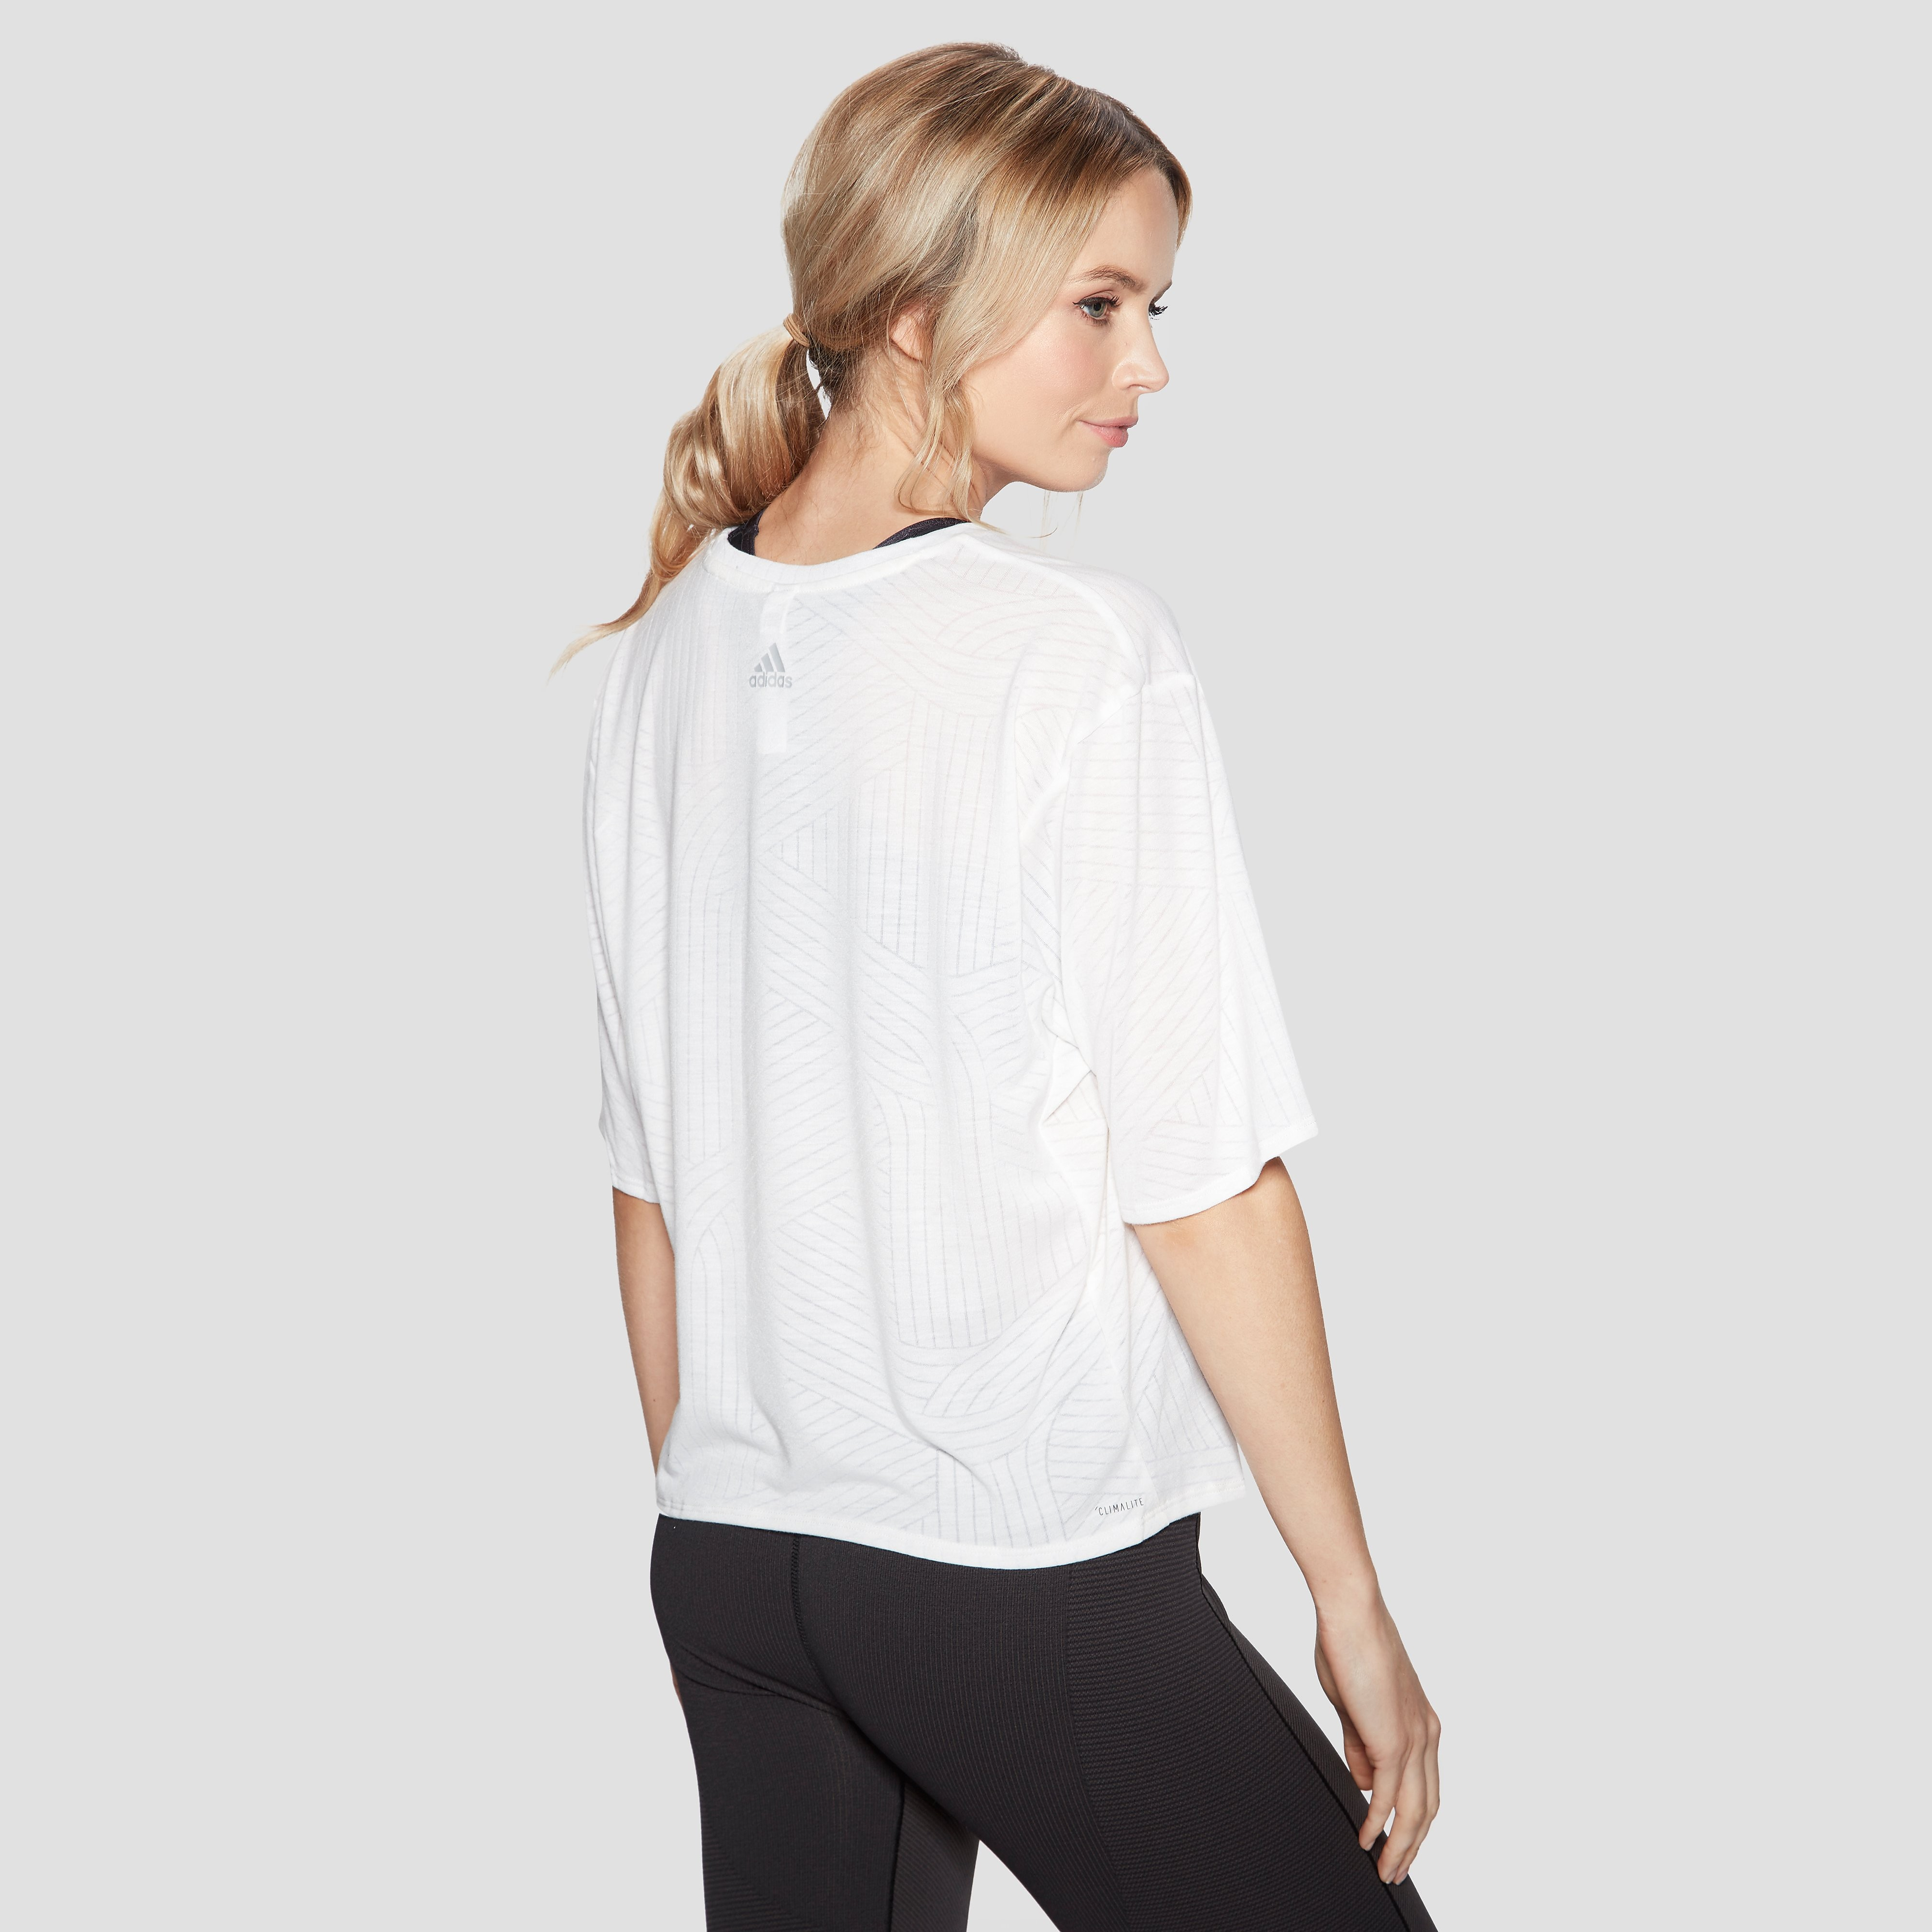 adidas Freelift Climalite Aeroknit Women's Training T-Shirt